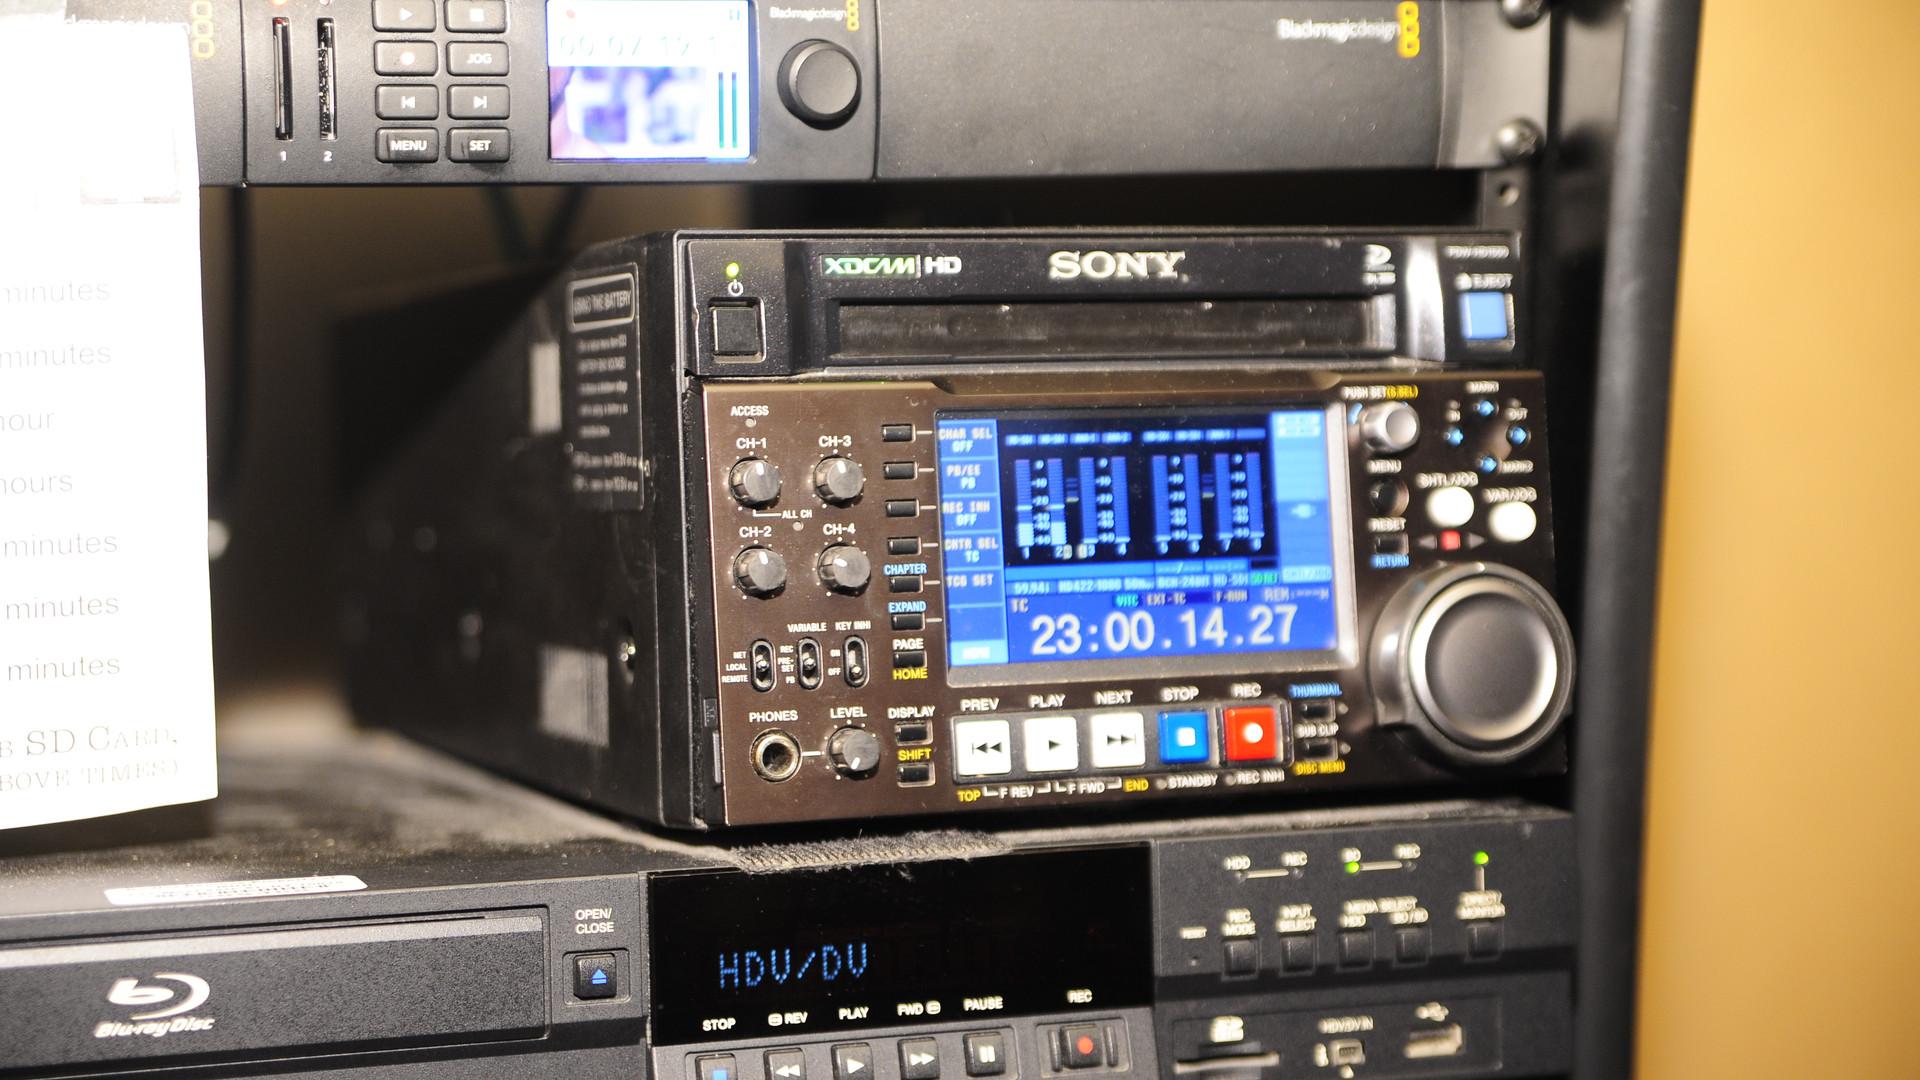 Young Boss Media filming equipment